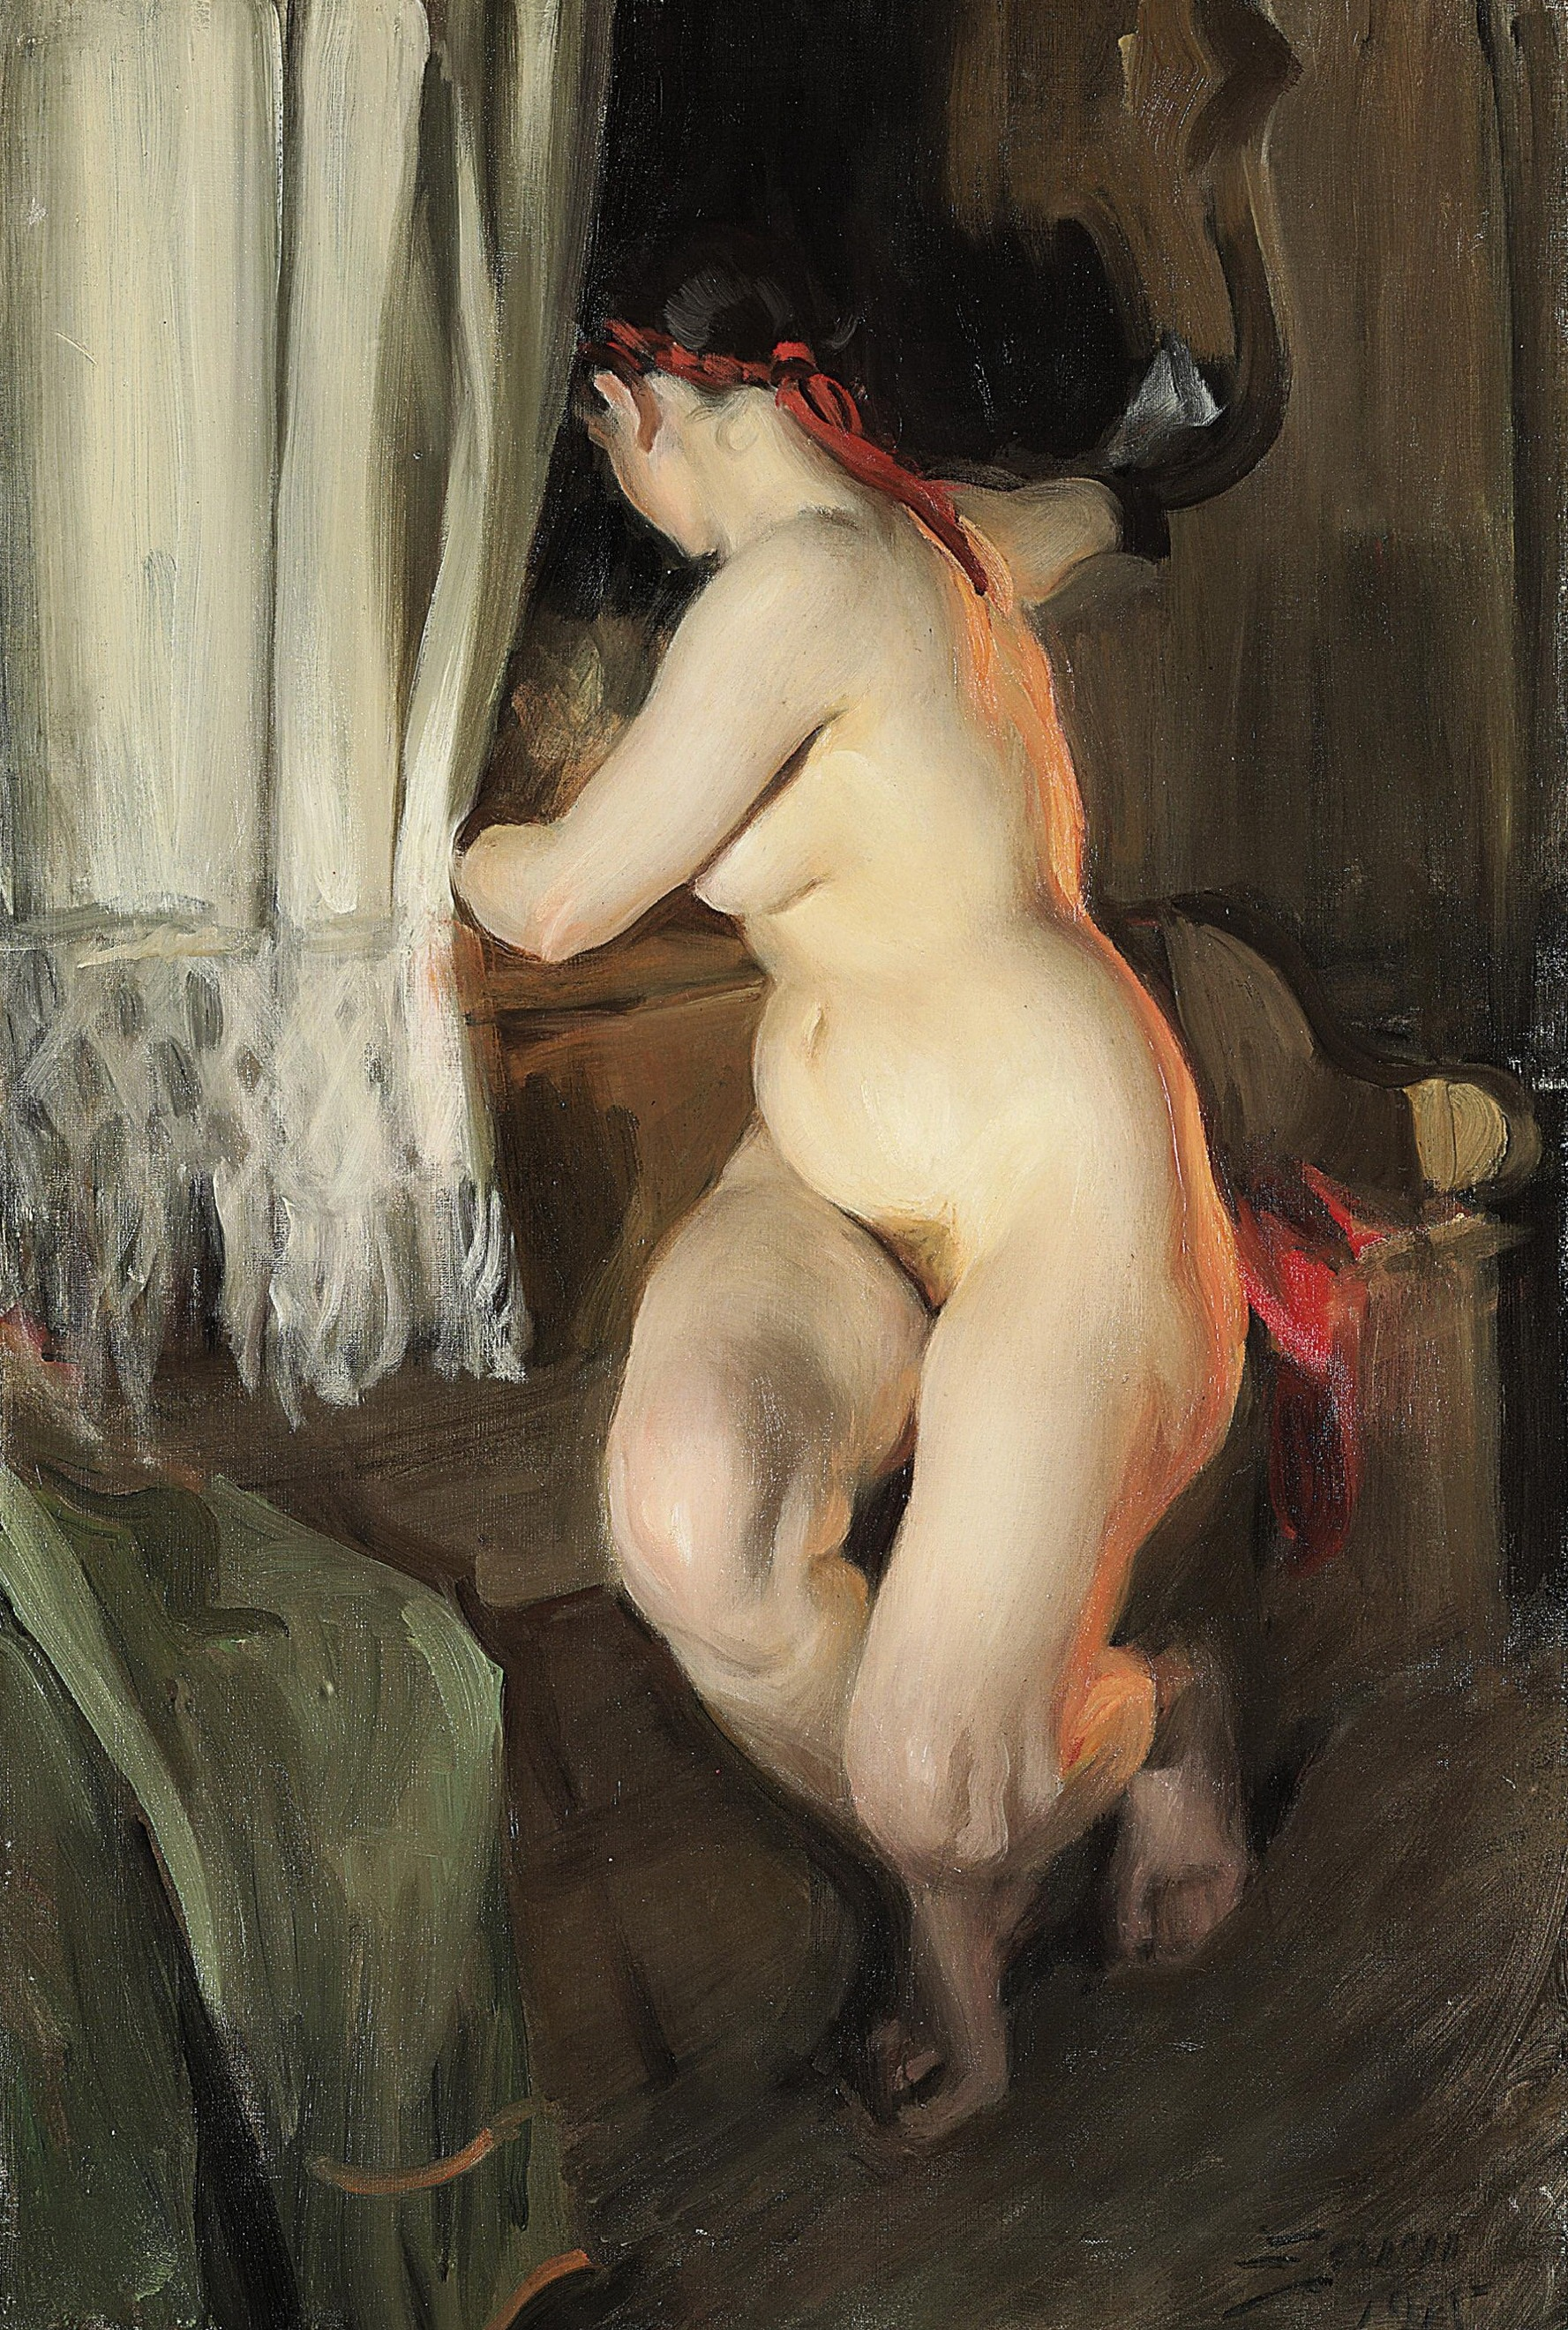 Anders Leonard Zorn. 1860-1920. Повернувшаяся обнаженная. 1915, 91 х 60 см. Частная коллекция